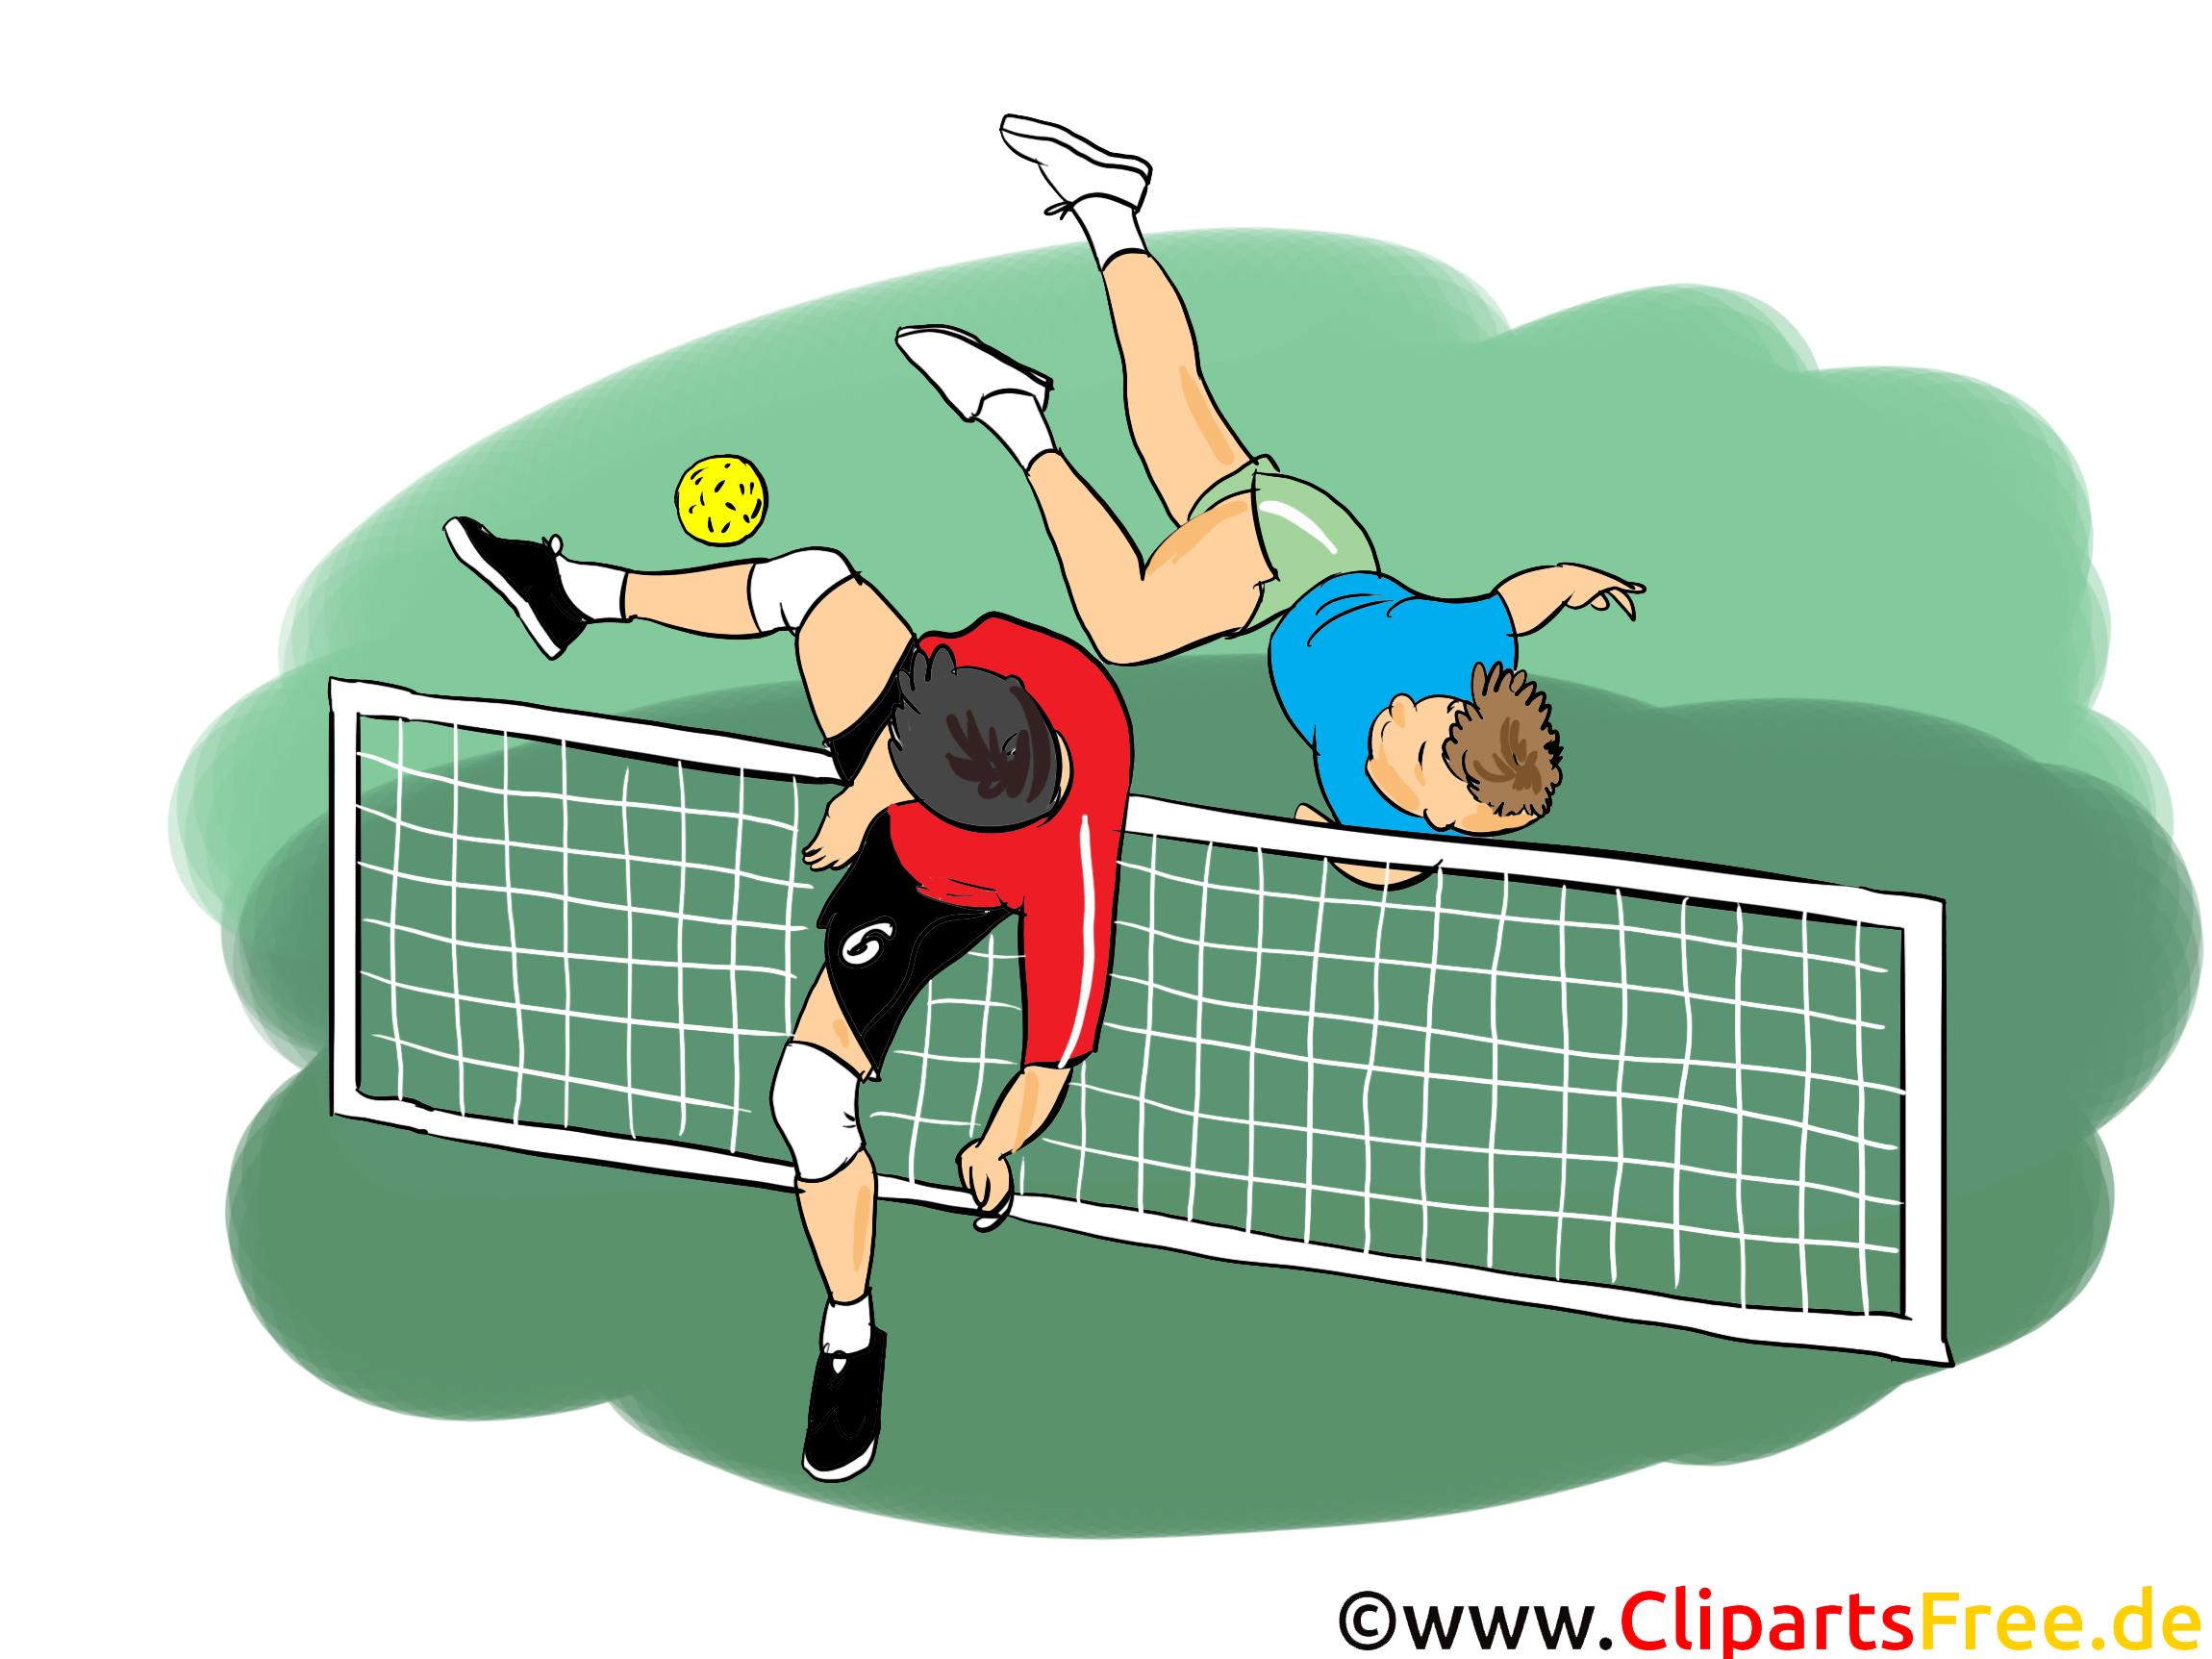 Futbol Tenis Clipart, resim, çizgi film, çizgi roman, illüstrasyon